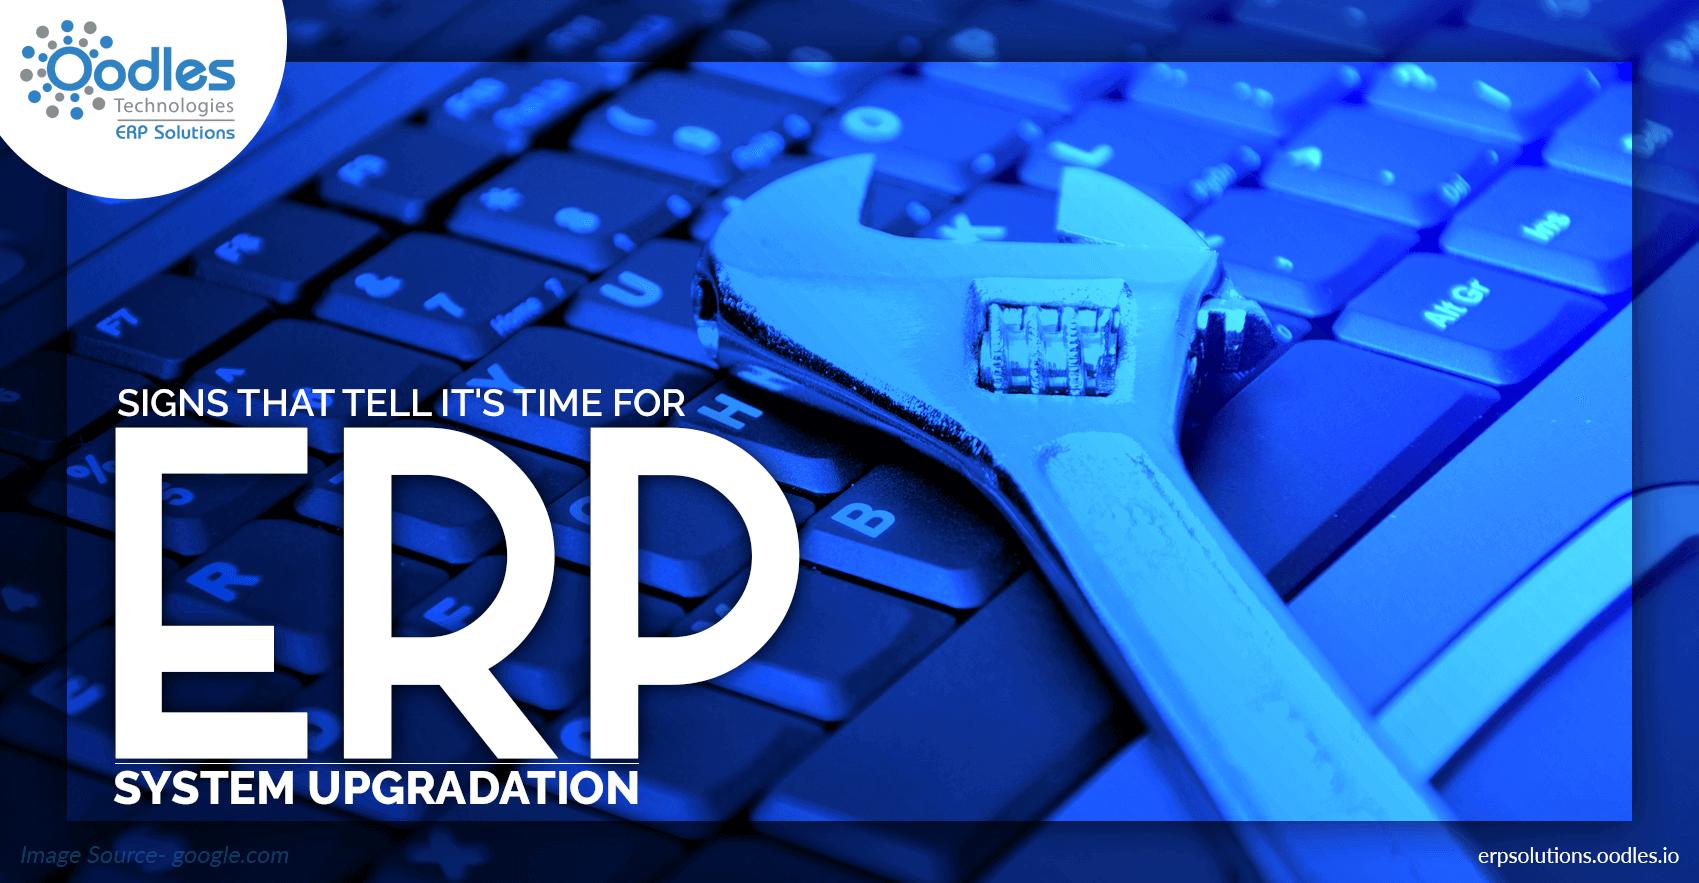 ERP System Upgradation